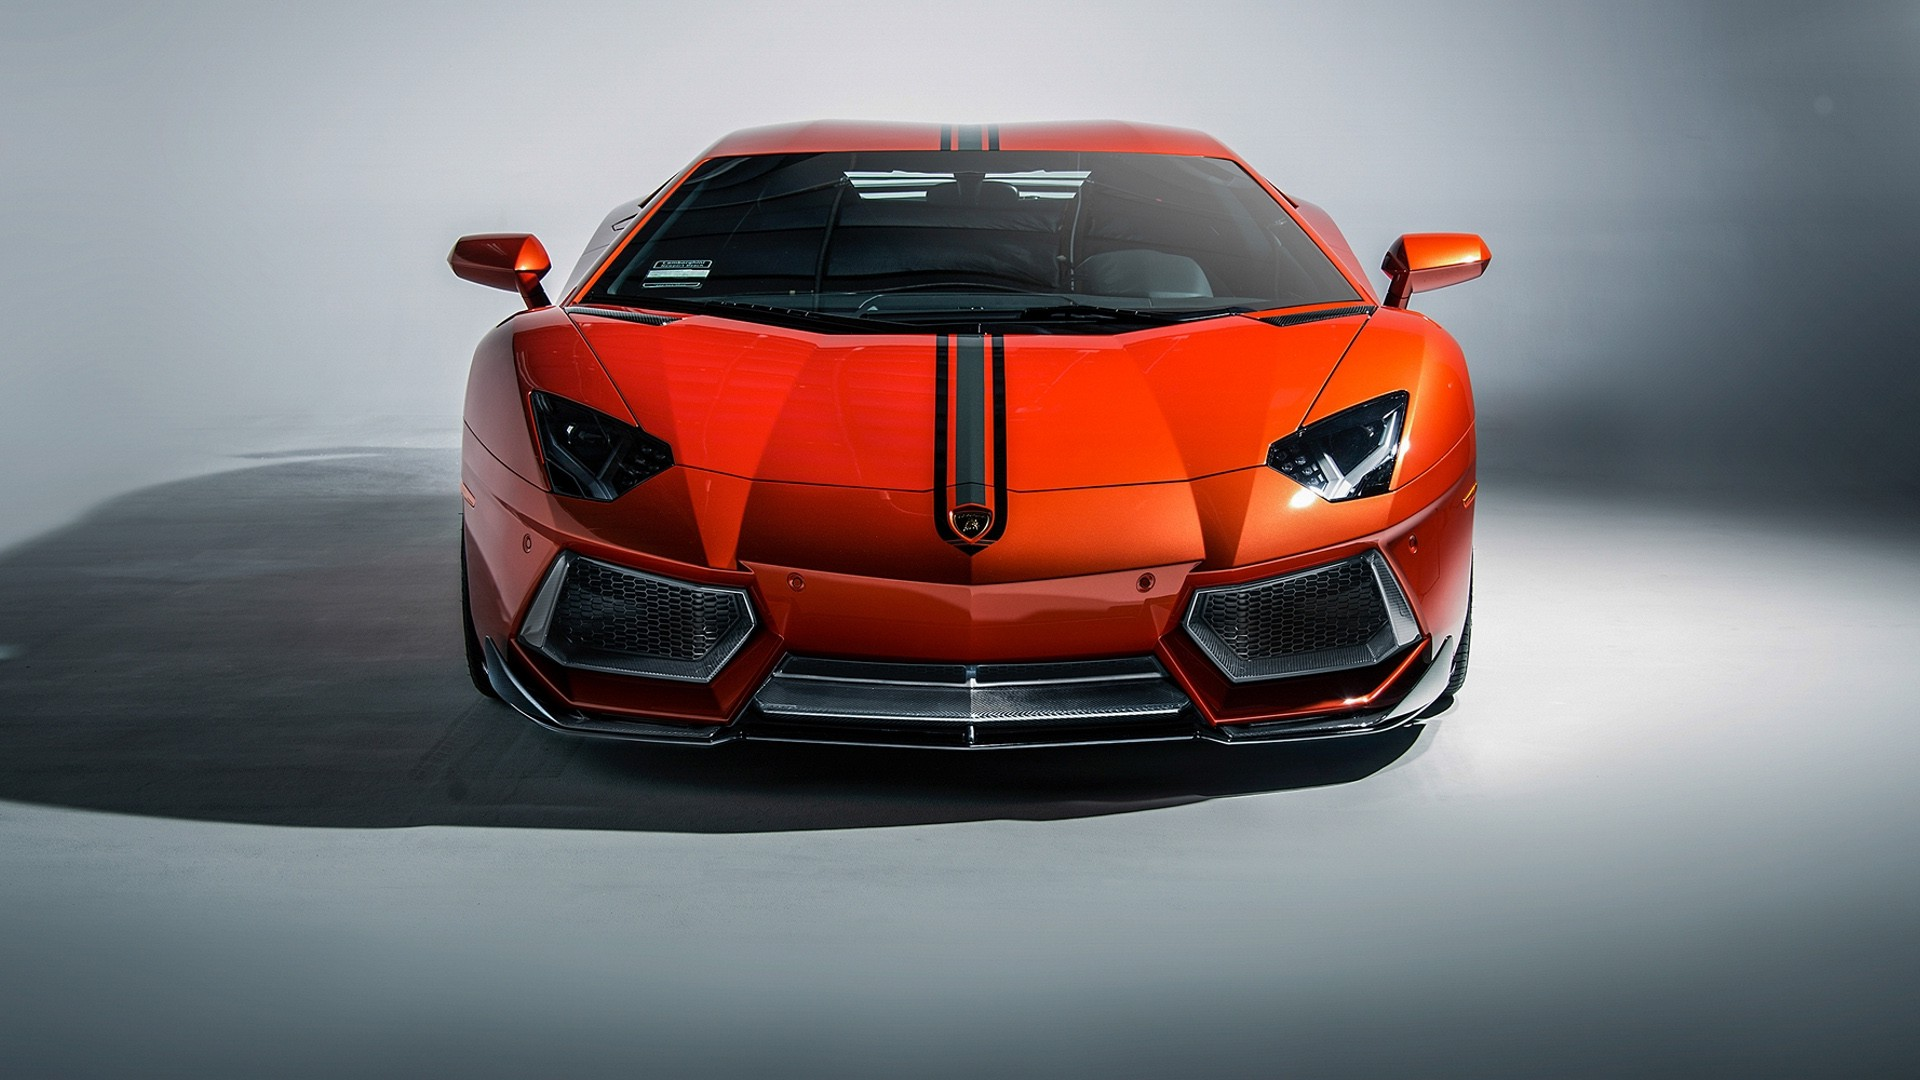 Car Wallpapers Lamborghini Gallardo 2015 Vorsteiner Lamborghini Aventador Coupe 3 Wallpaper